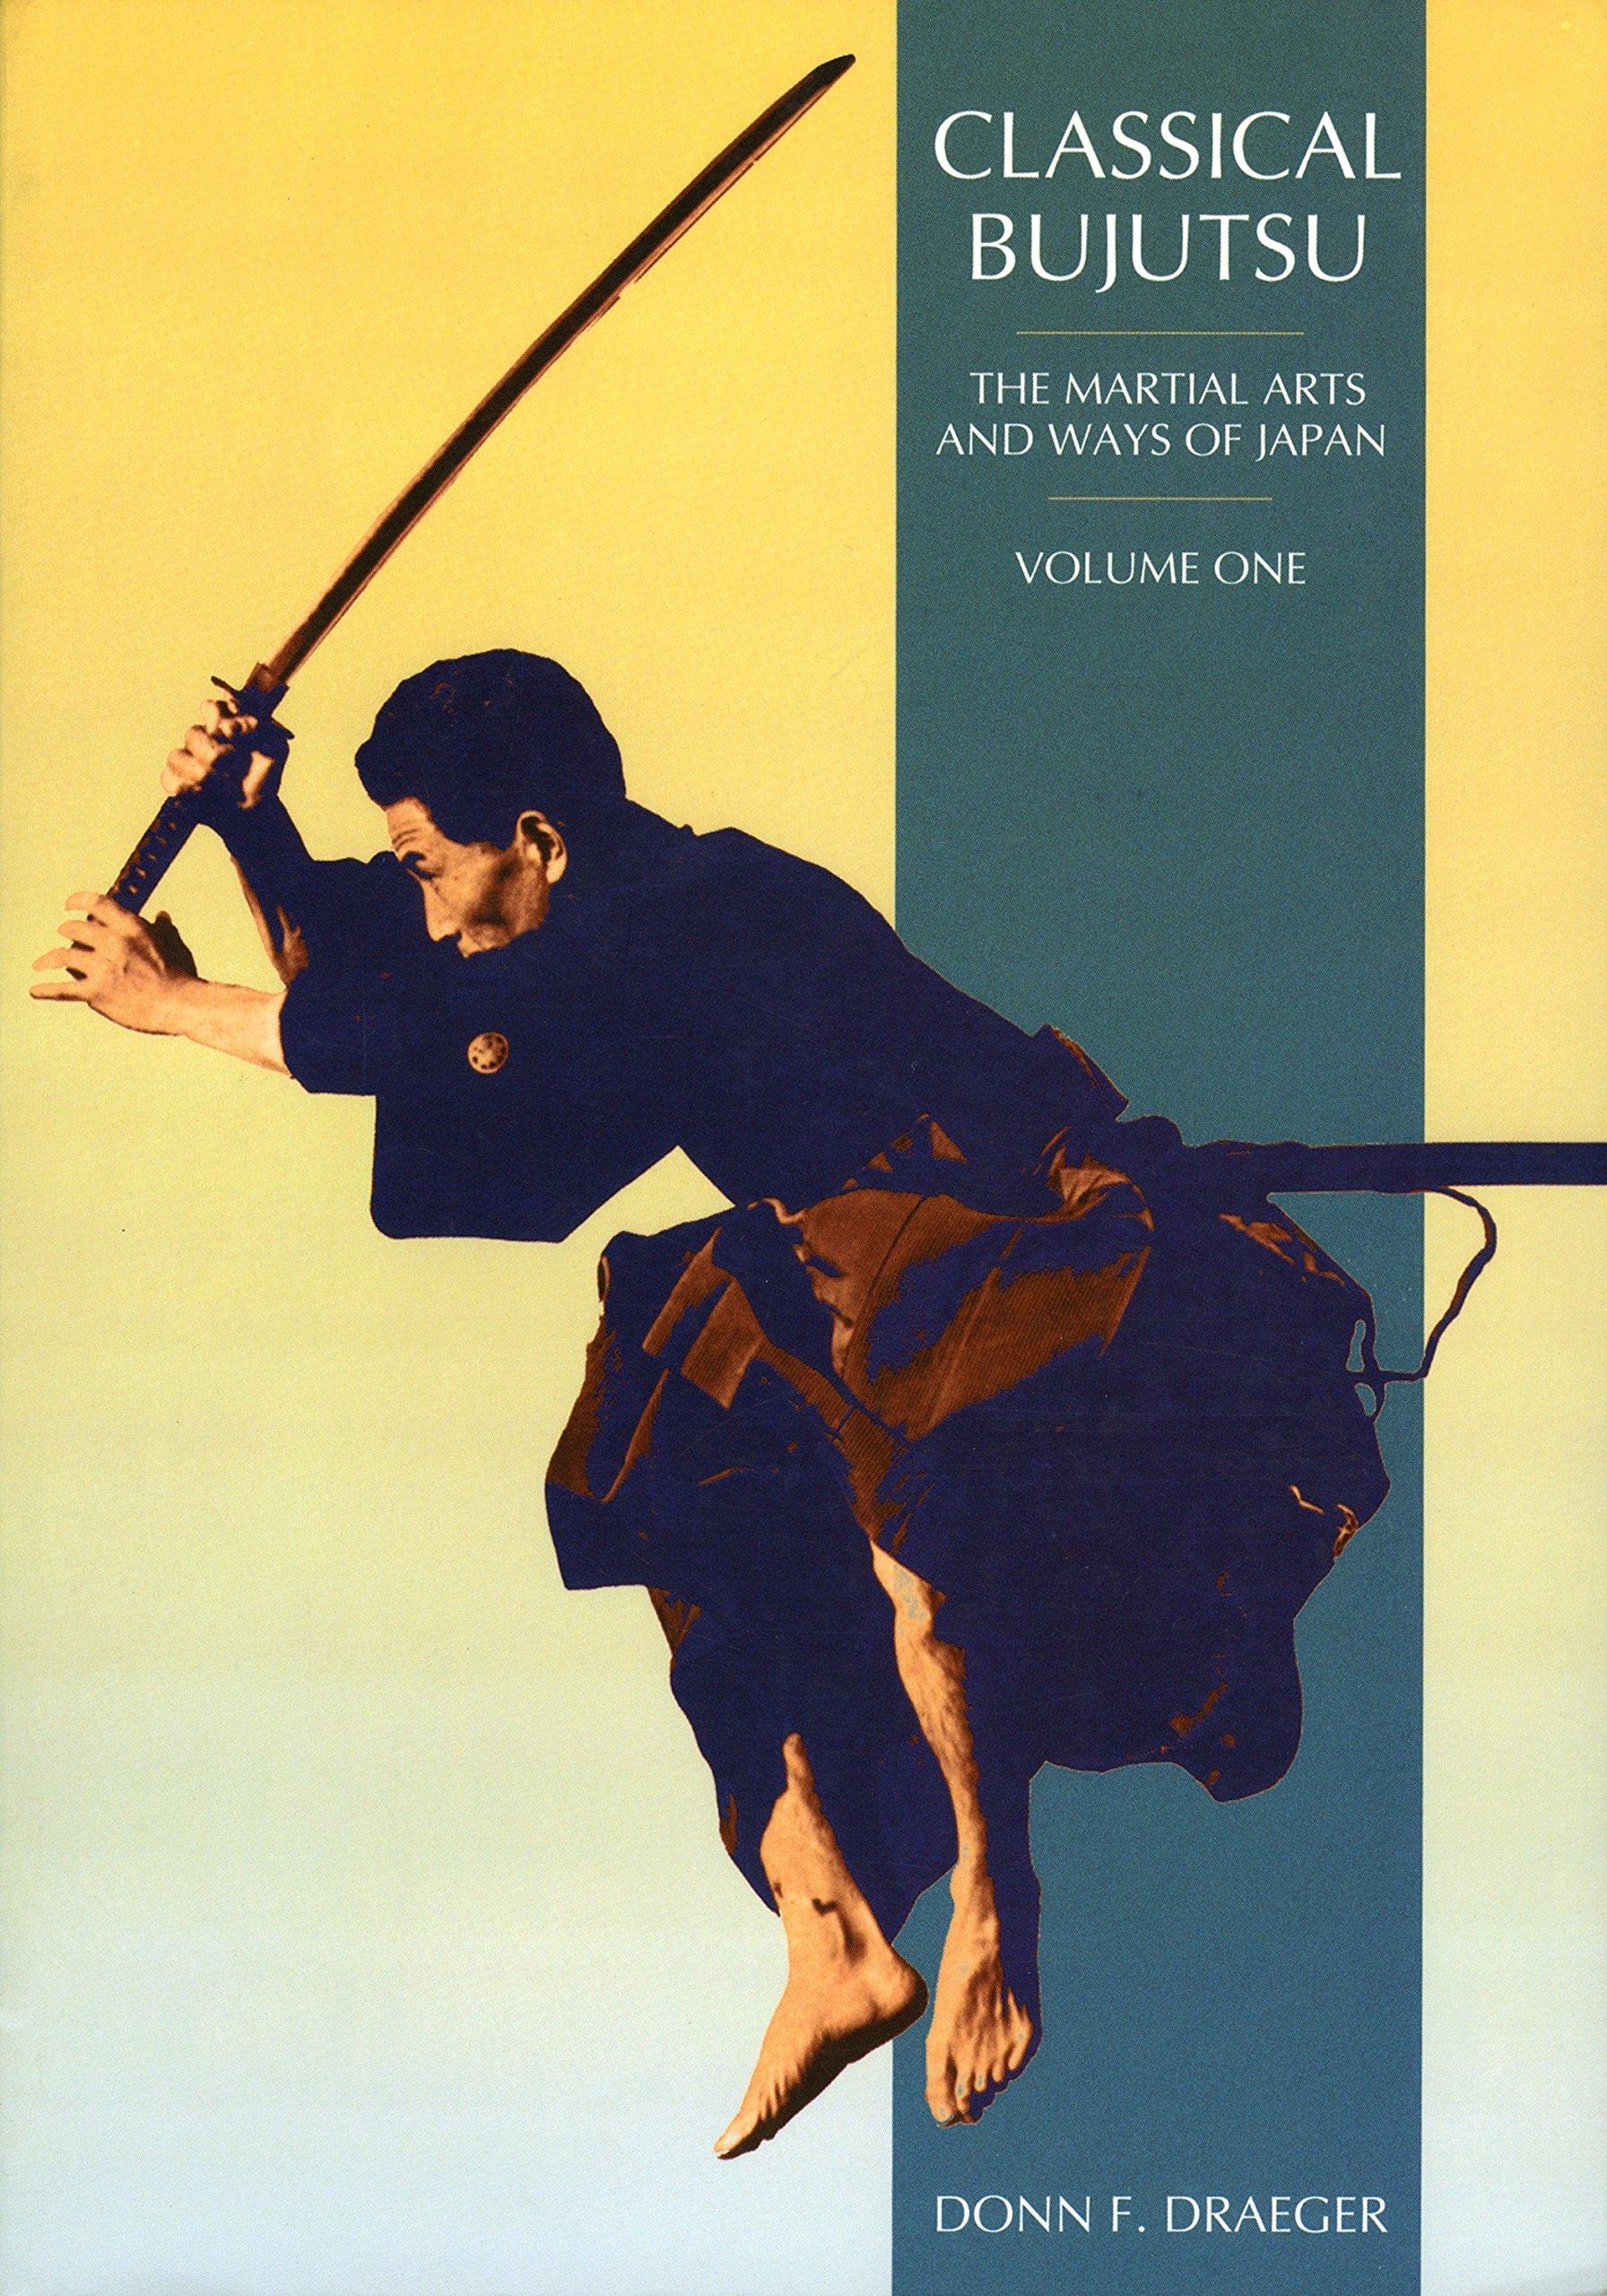 Classical bujutsu martial arts and ways of japan donn f draeger classical bujutsu martial arts and ways of japan donn f draeger 9780834802339 amazon books fandeluxe Images